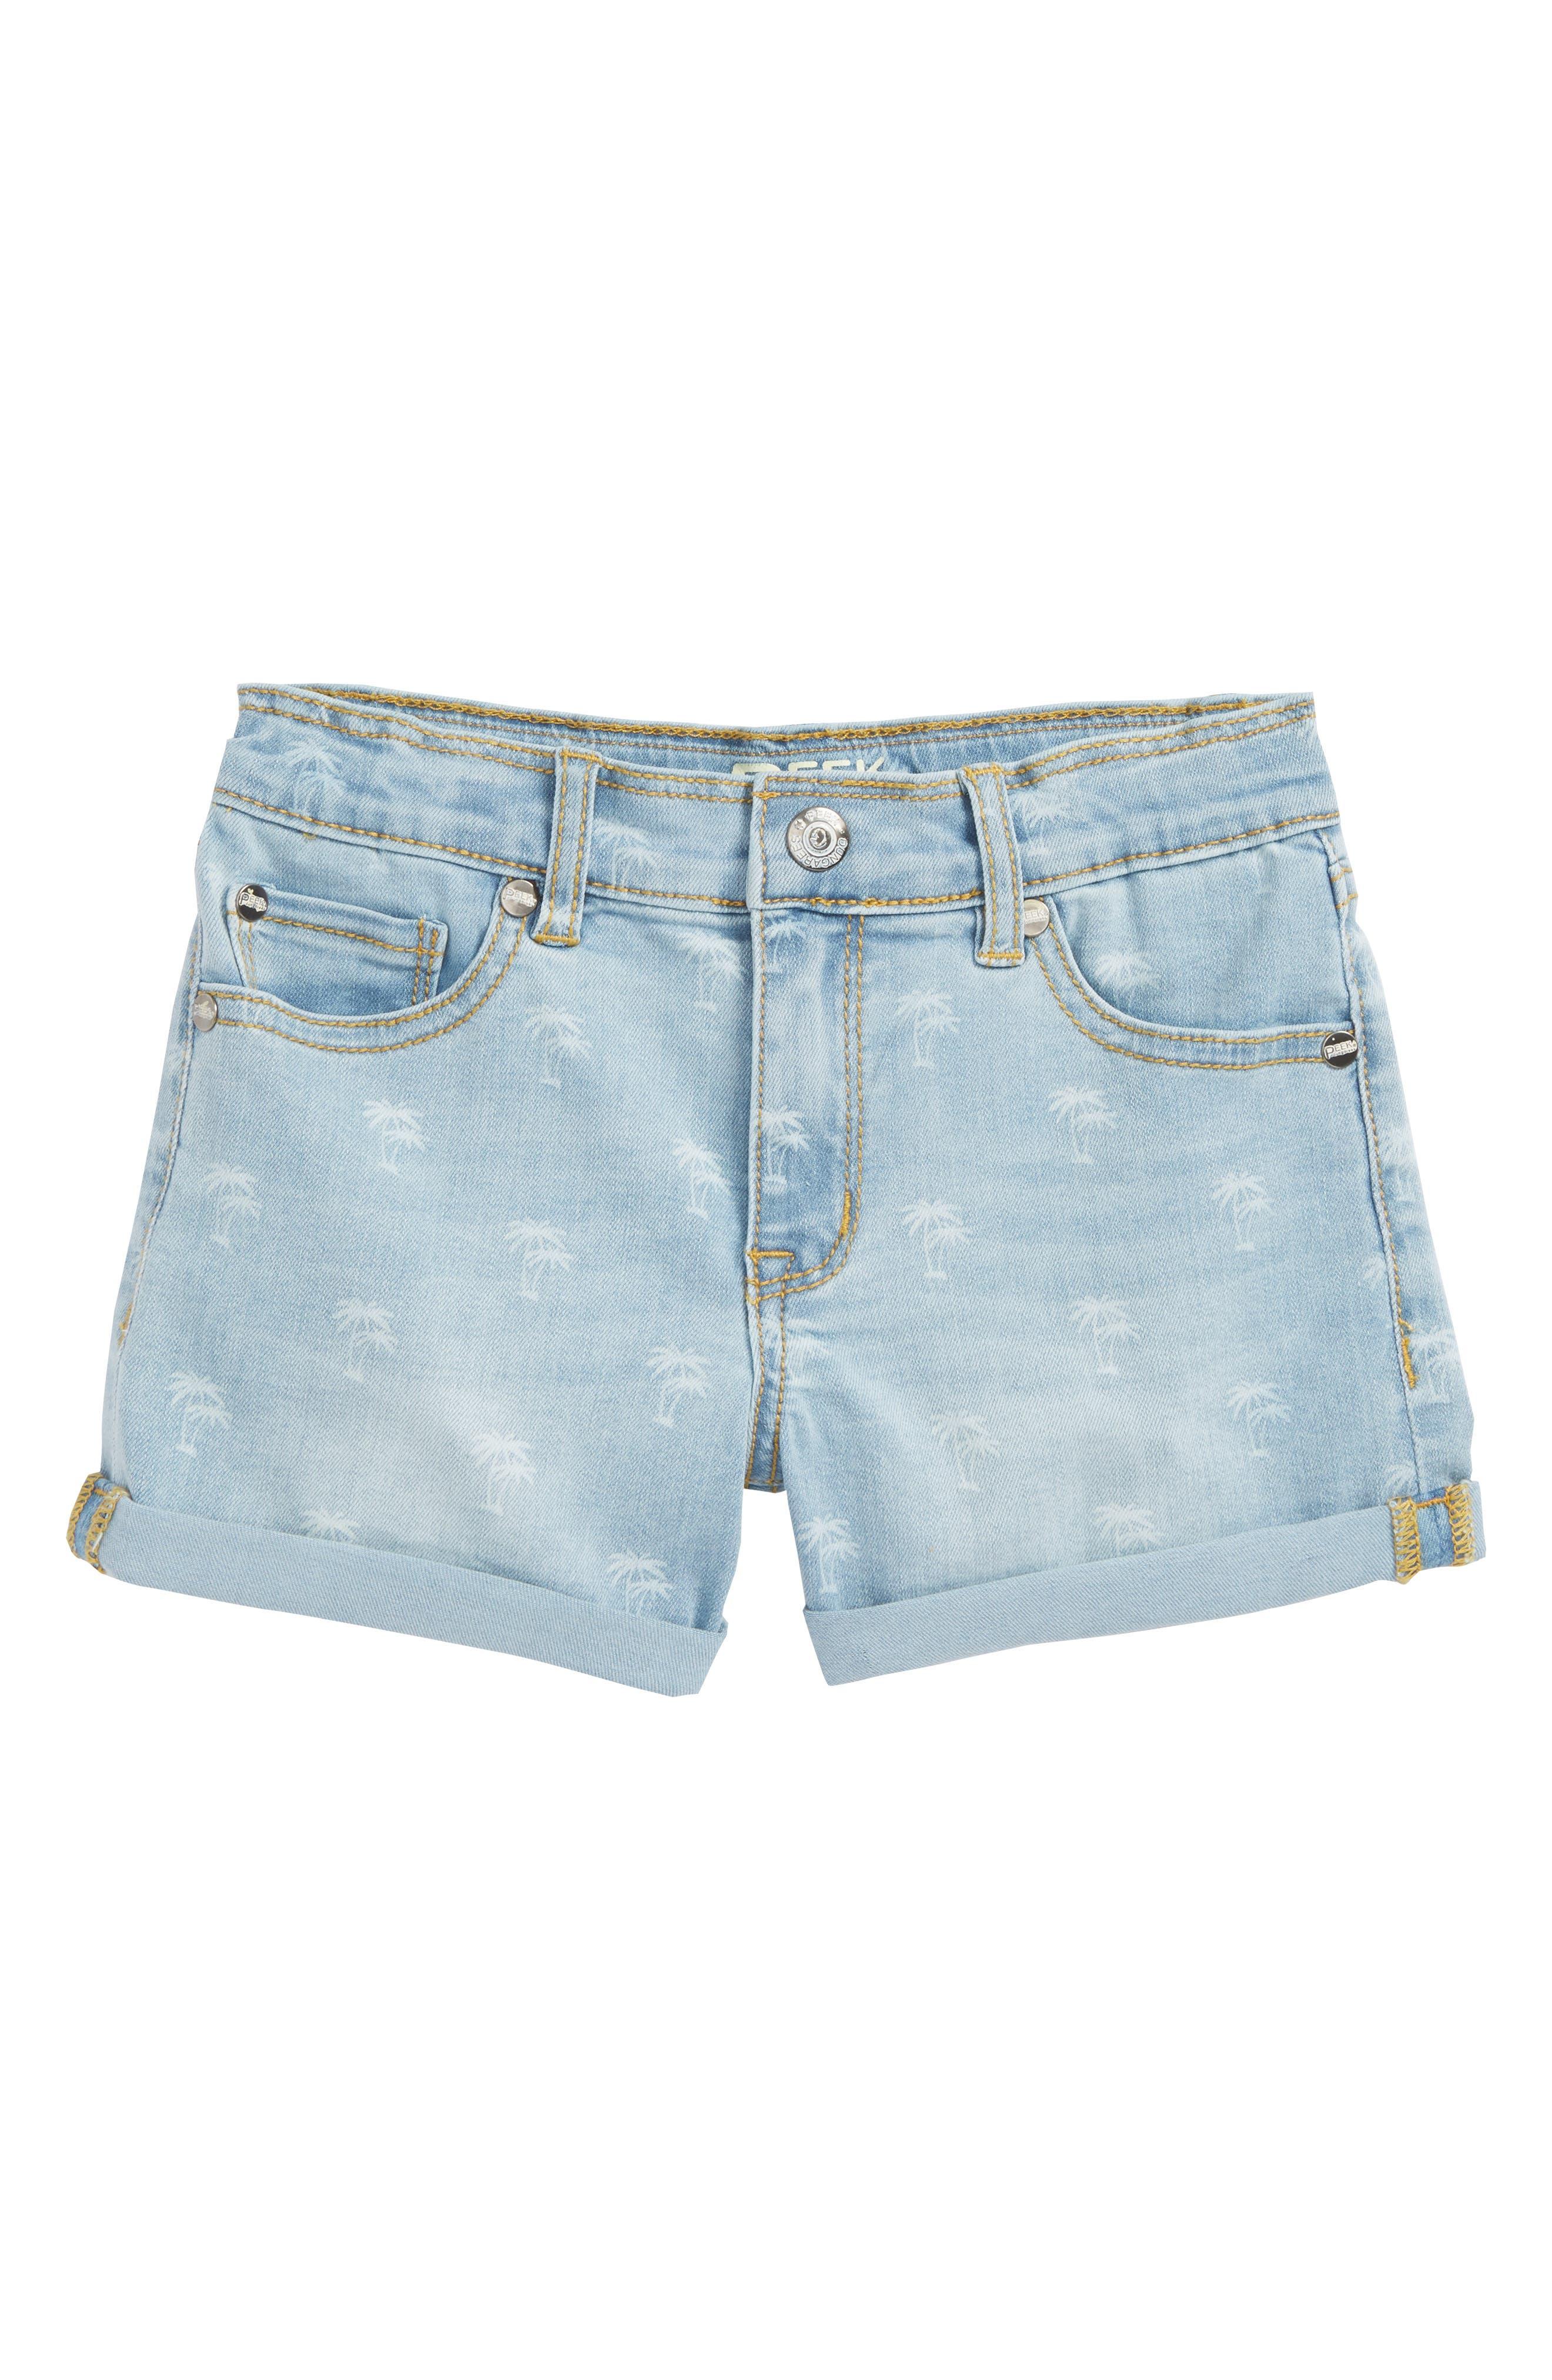 Peek Griffin Palm Tree Denim Shorts (Toddler Girls, Little Girls & Big Girls)